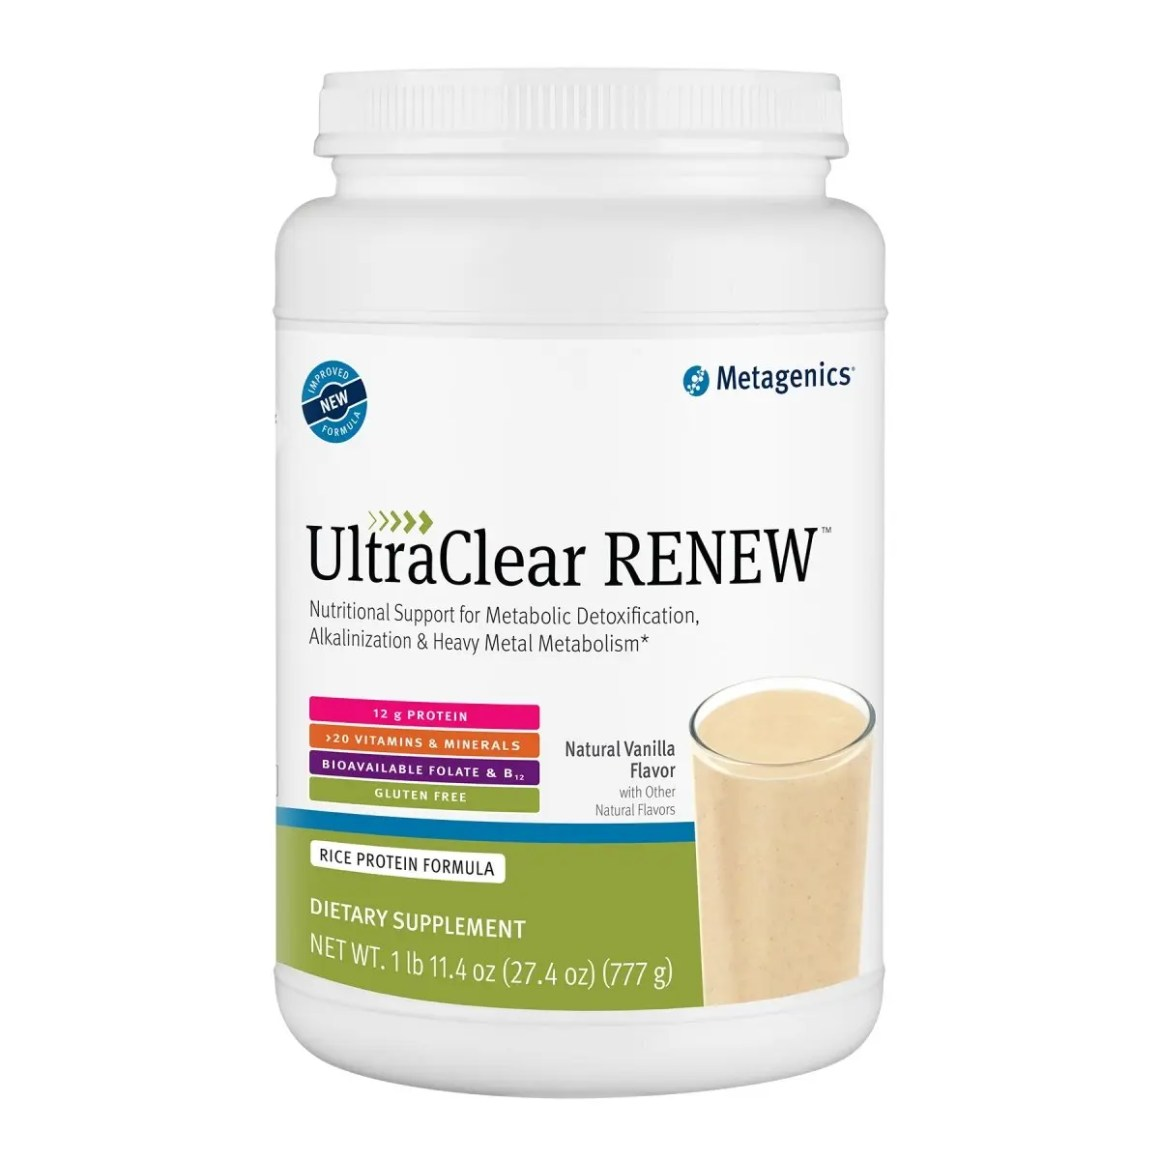 UltraClear Renew